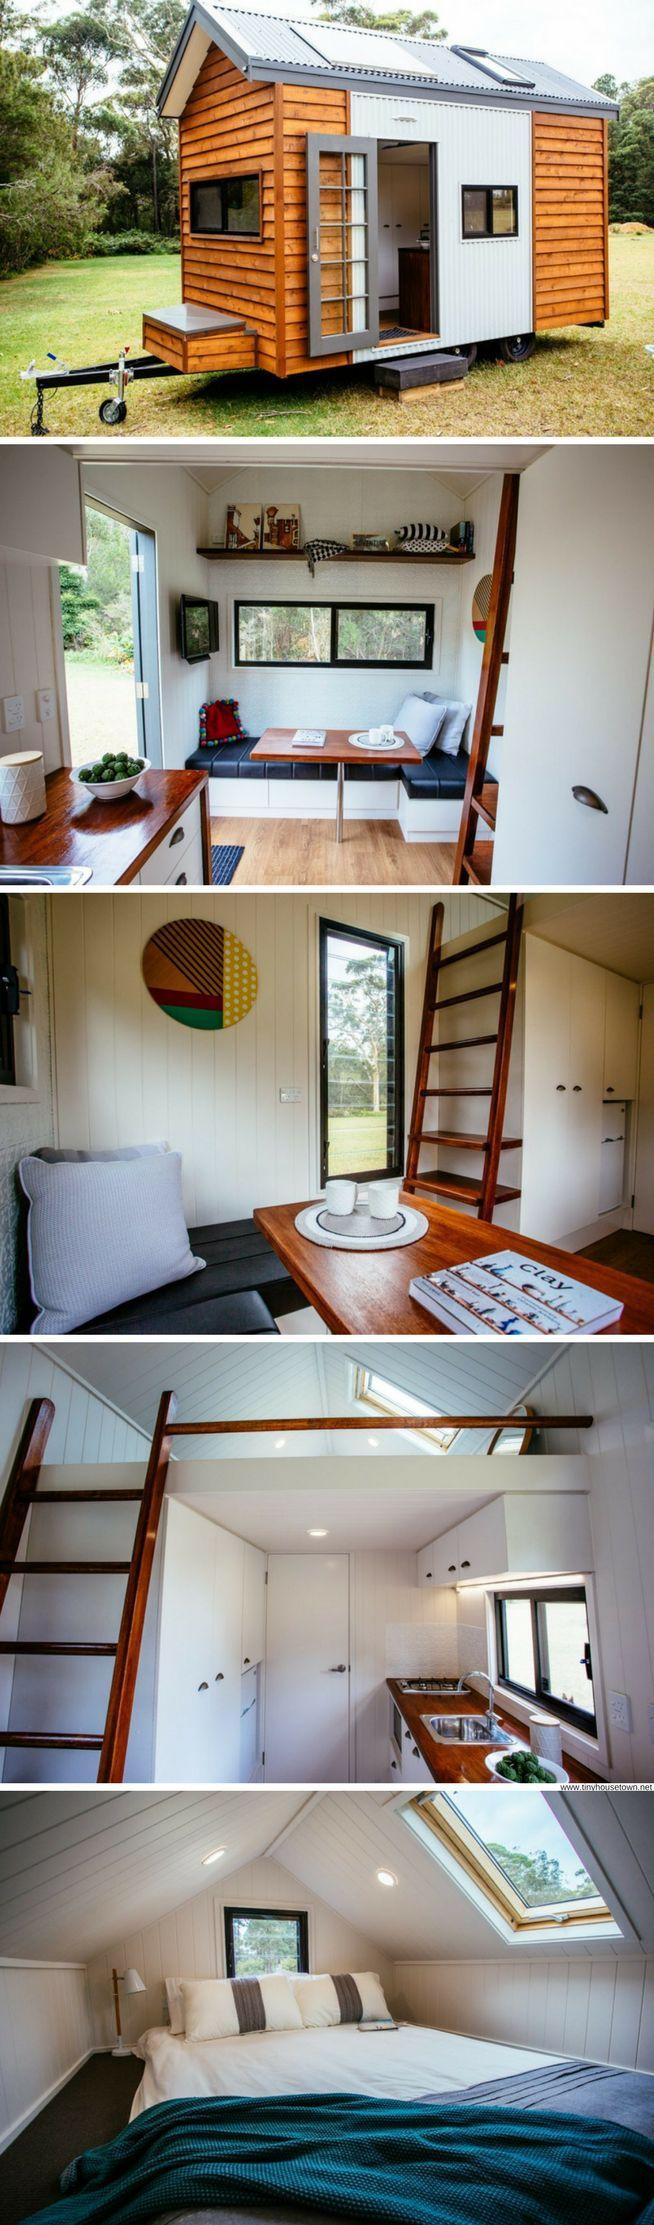 The Independent: an eco-friendly tiny house from Australia! - #australia #ecofriendly #House #Independent #Tiny #tinyhousebathroom